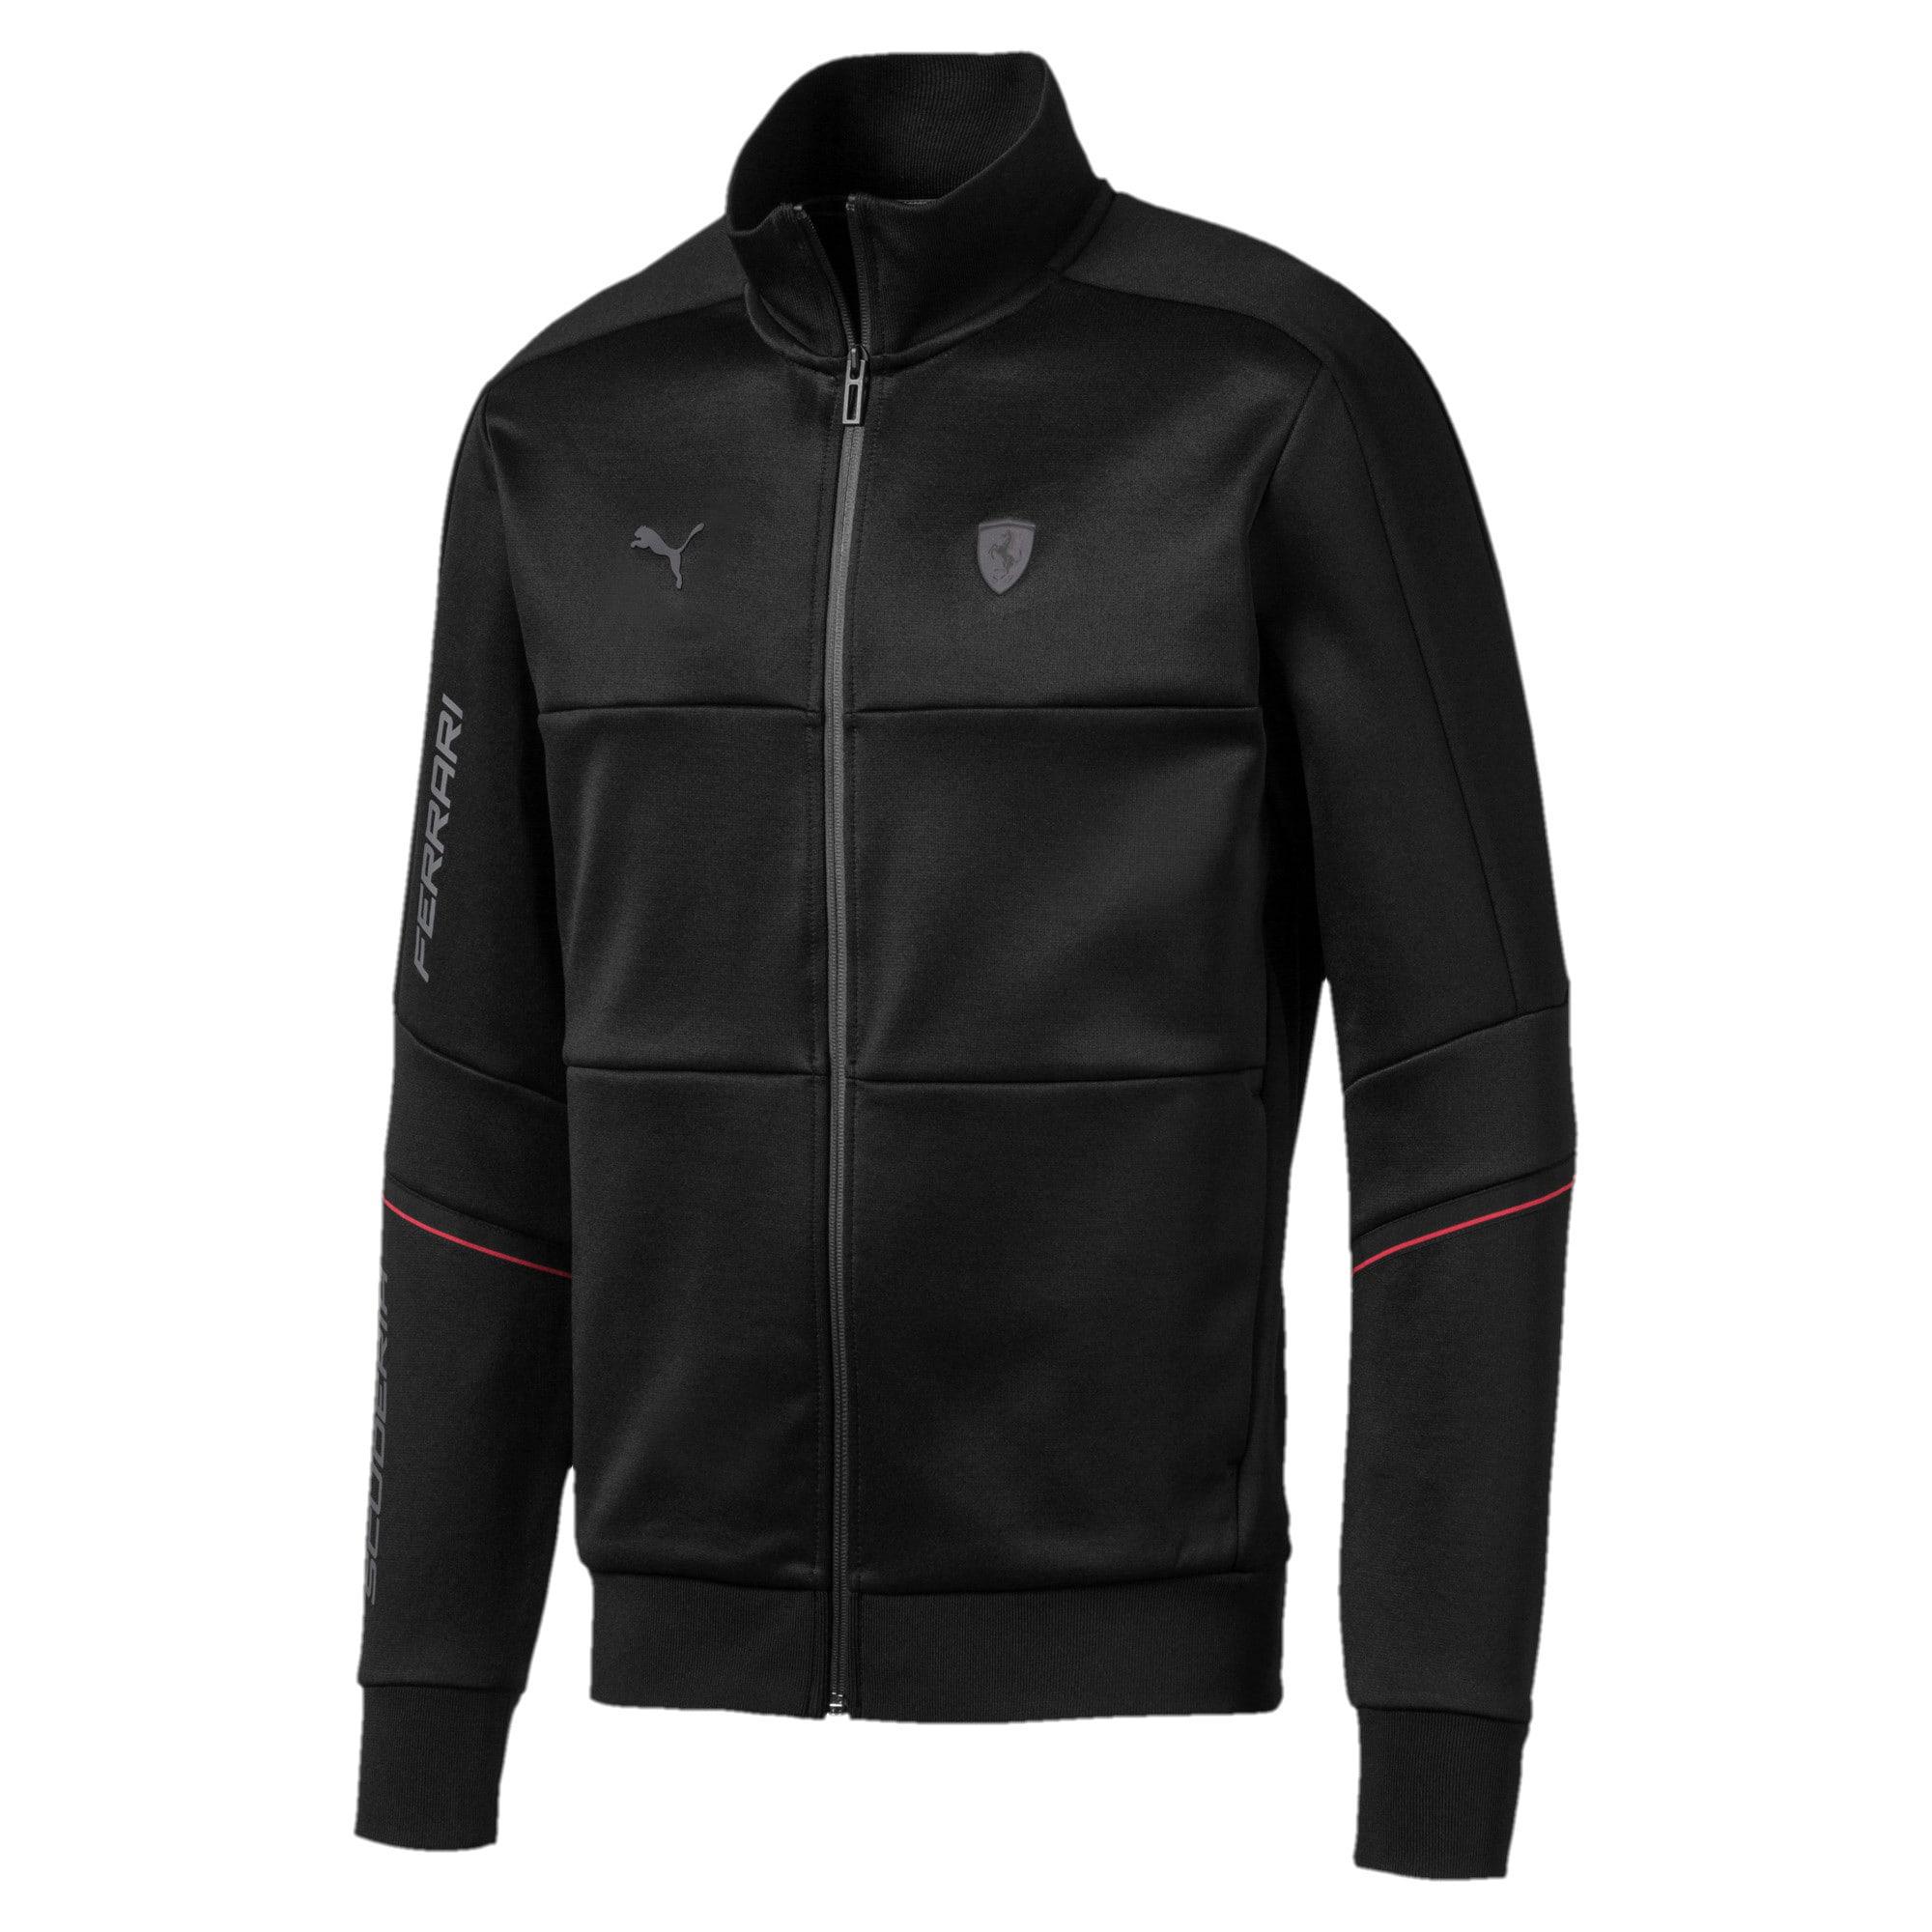 Thumbnail 1 of Ferrari Men's T7 Track Jacket, Puma Black, medium